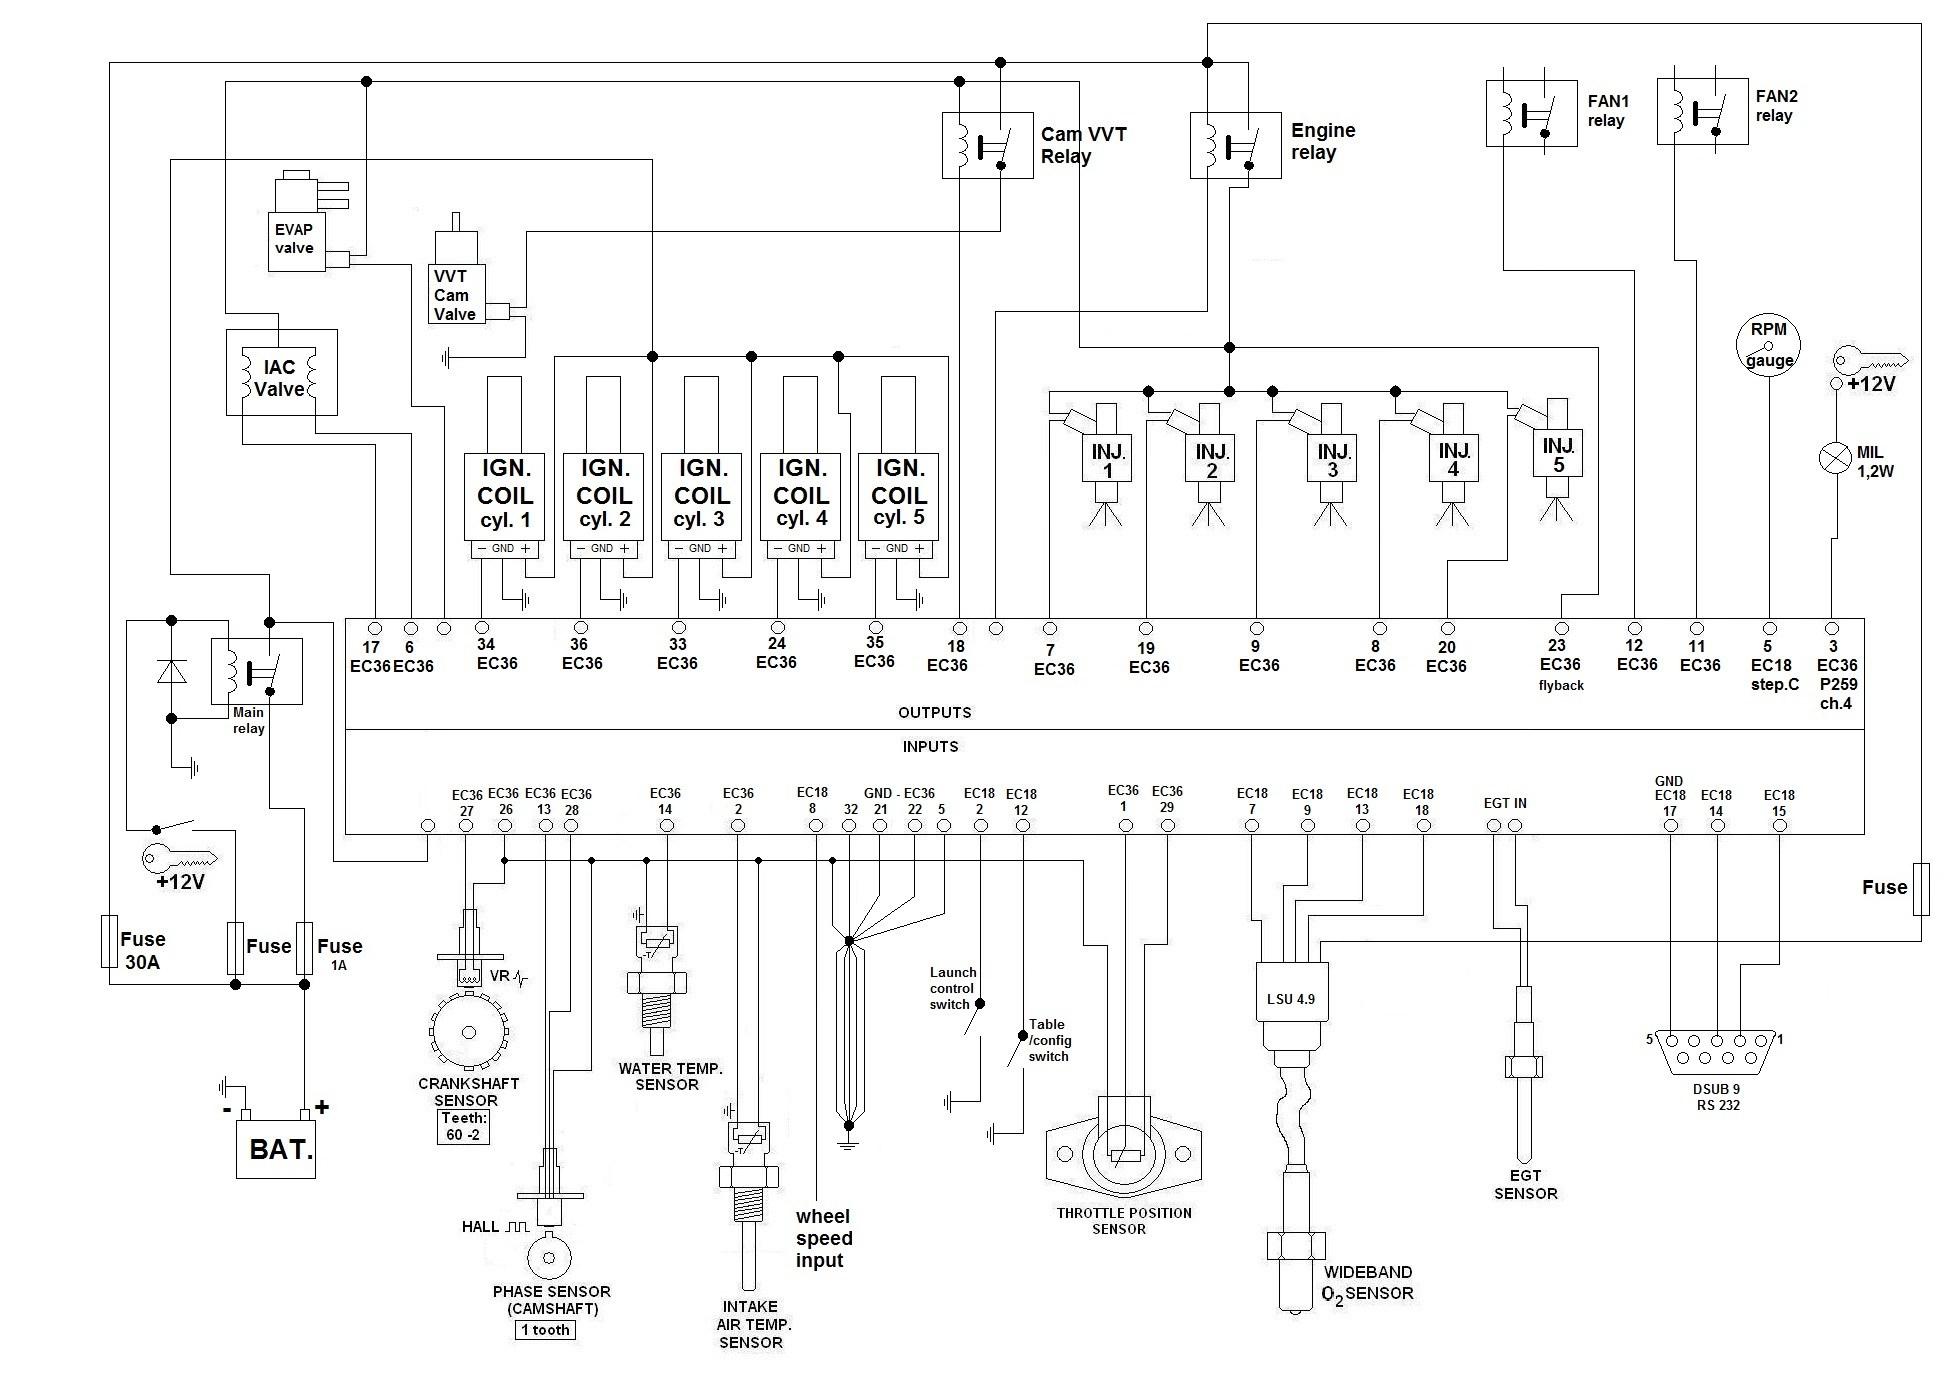 Fiat 128 Sedan Wiring - Diagram & Symbol Wiring wires-lover - wires -lover.parliamoneassieme.itwires-lover.parliamoneassieme.it